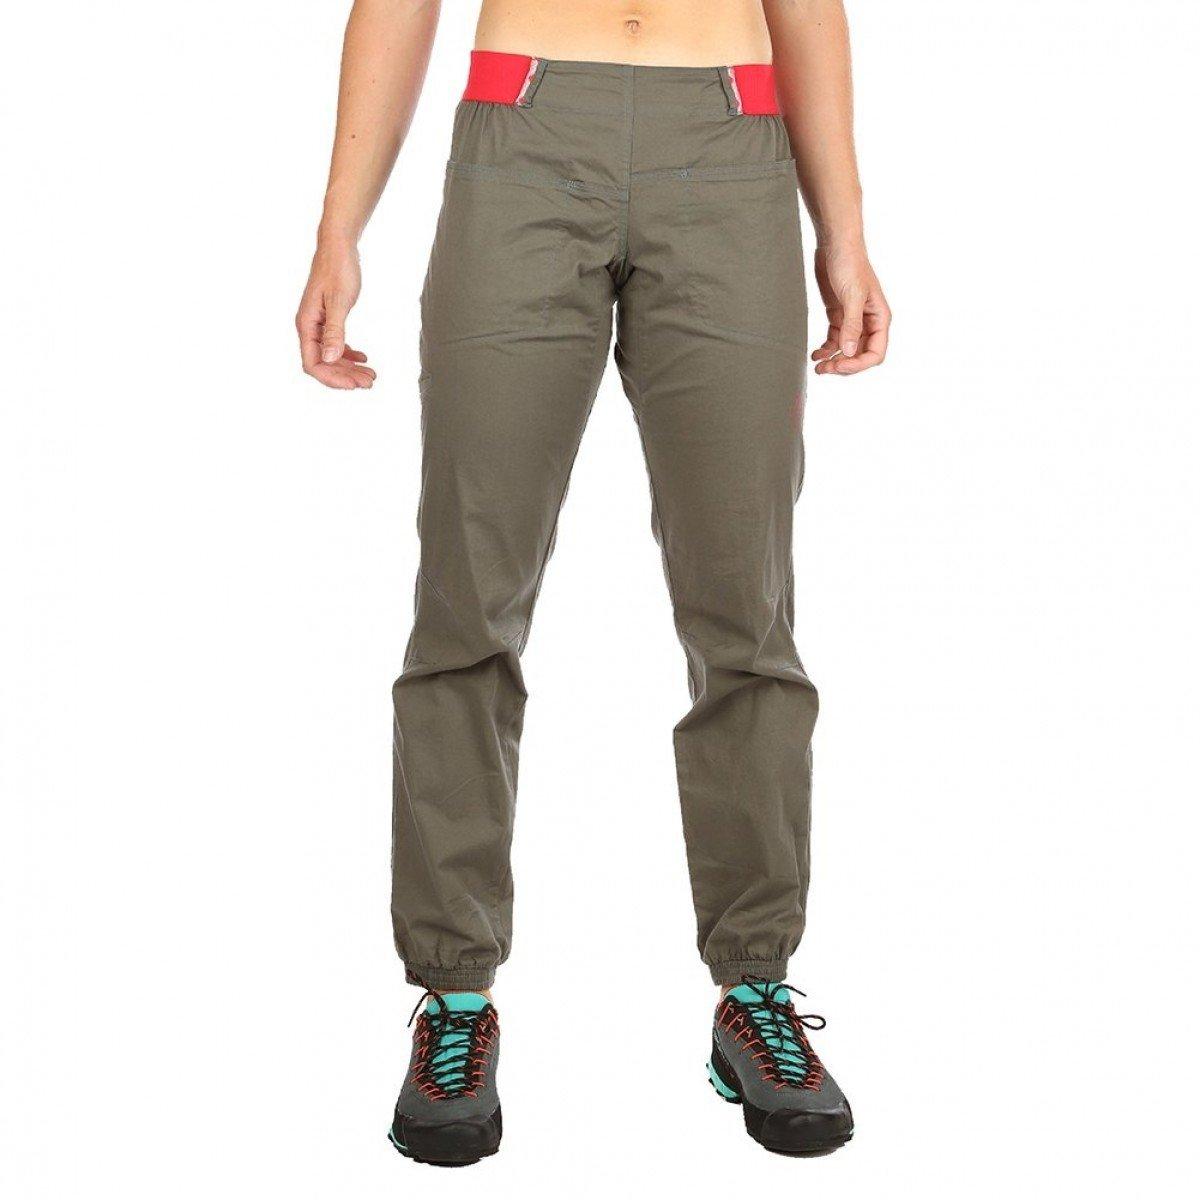 La Sportiva Tundra Pants